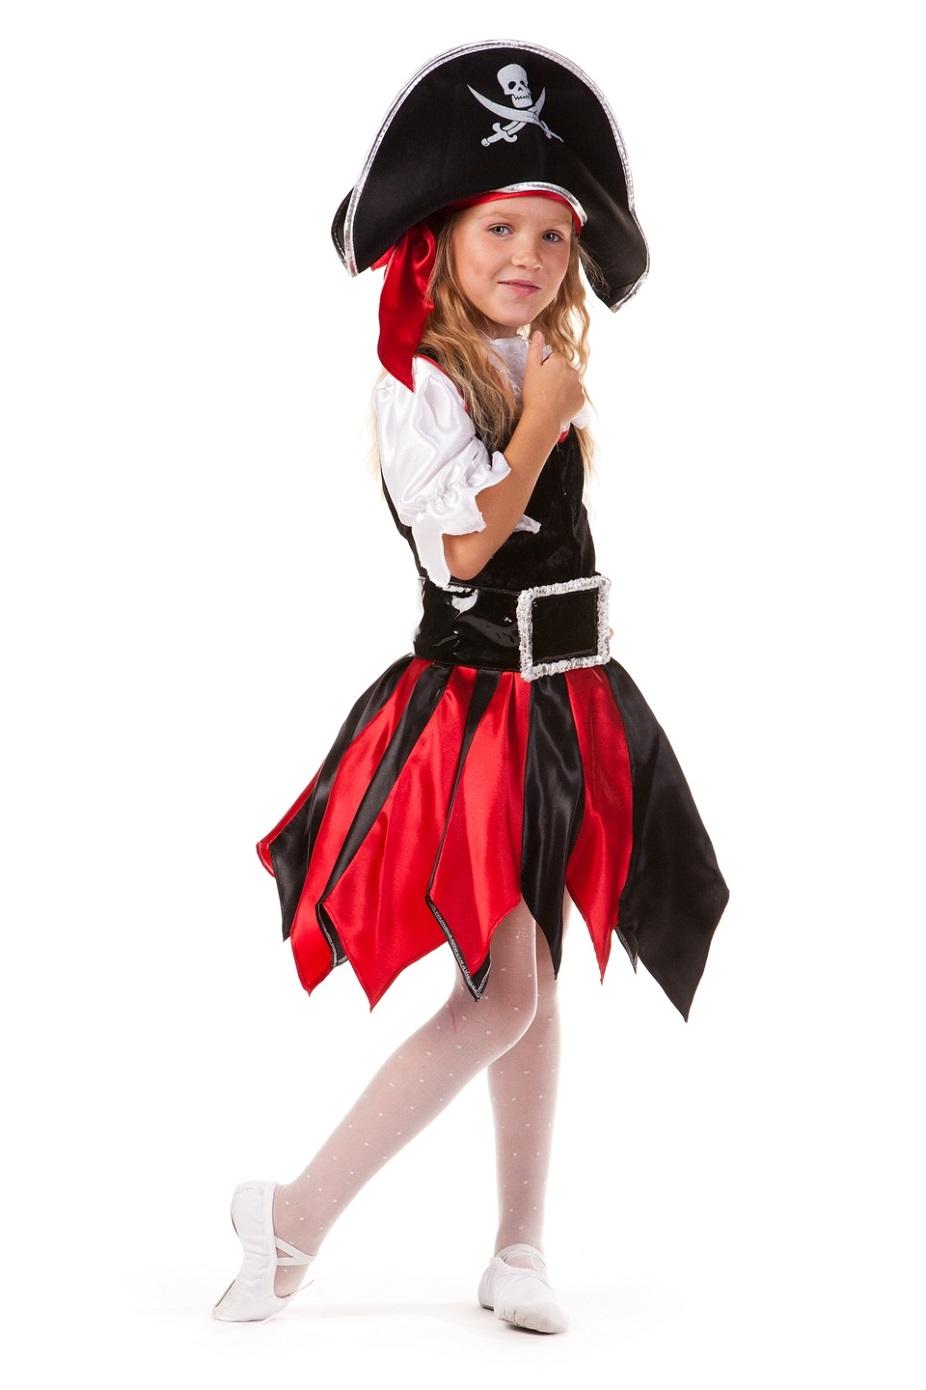 Костюм пиратки для девочки подростка своими руками